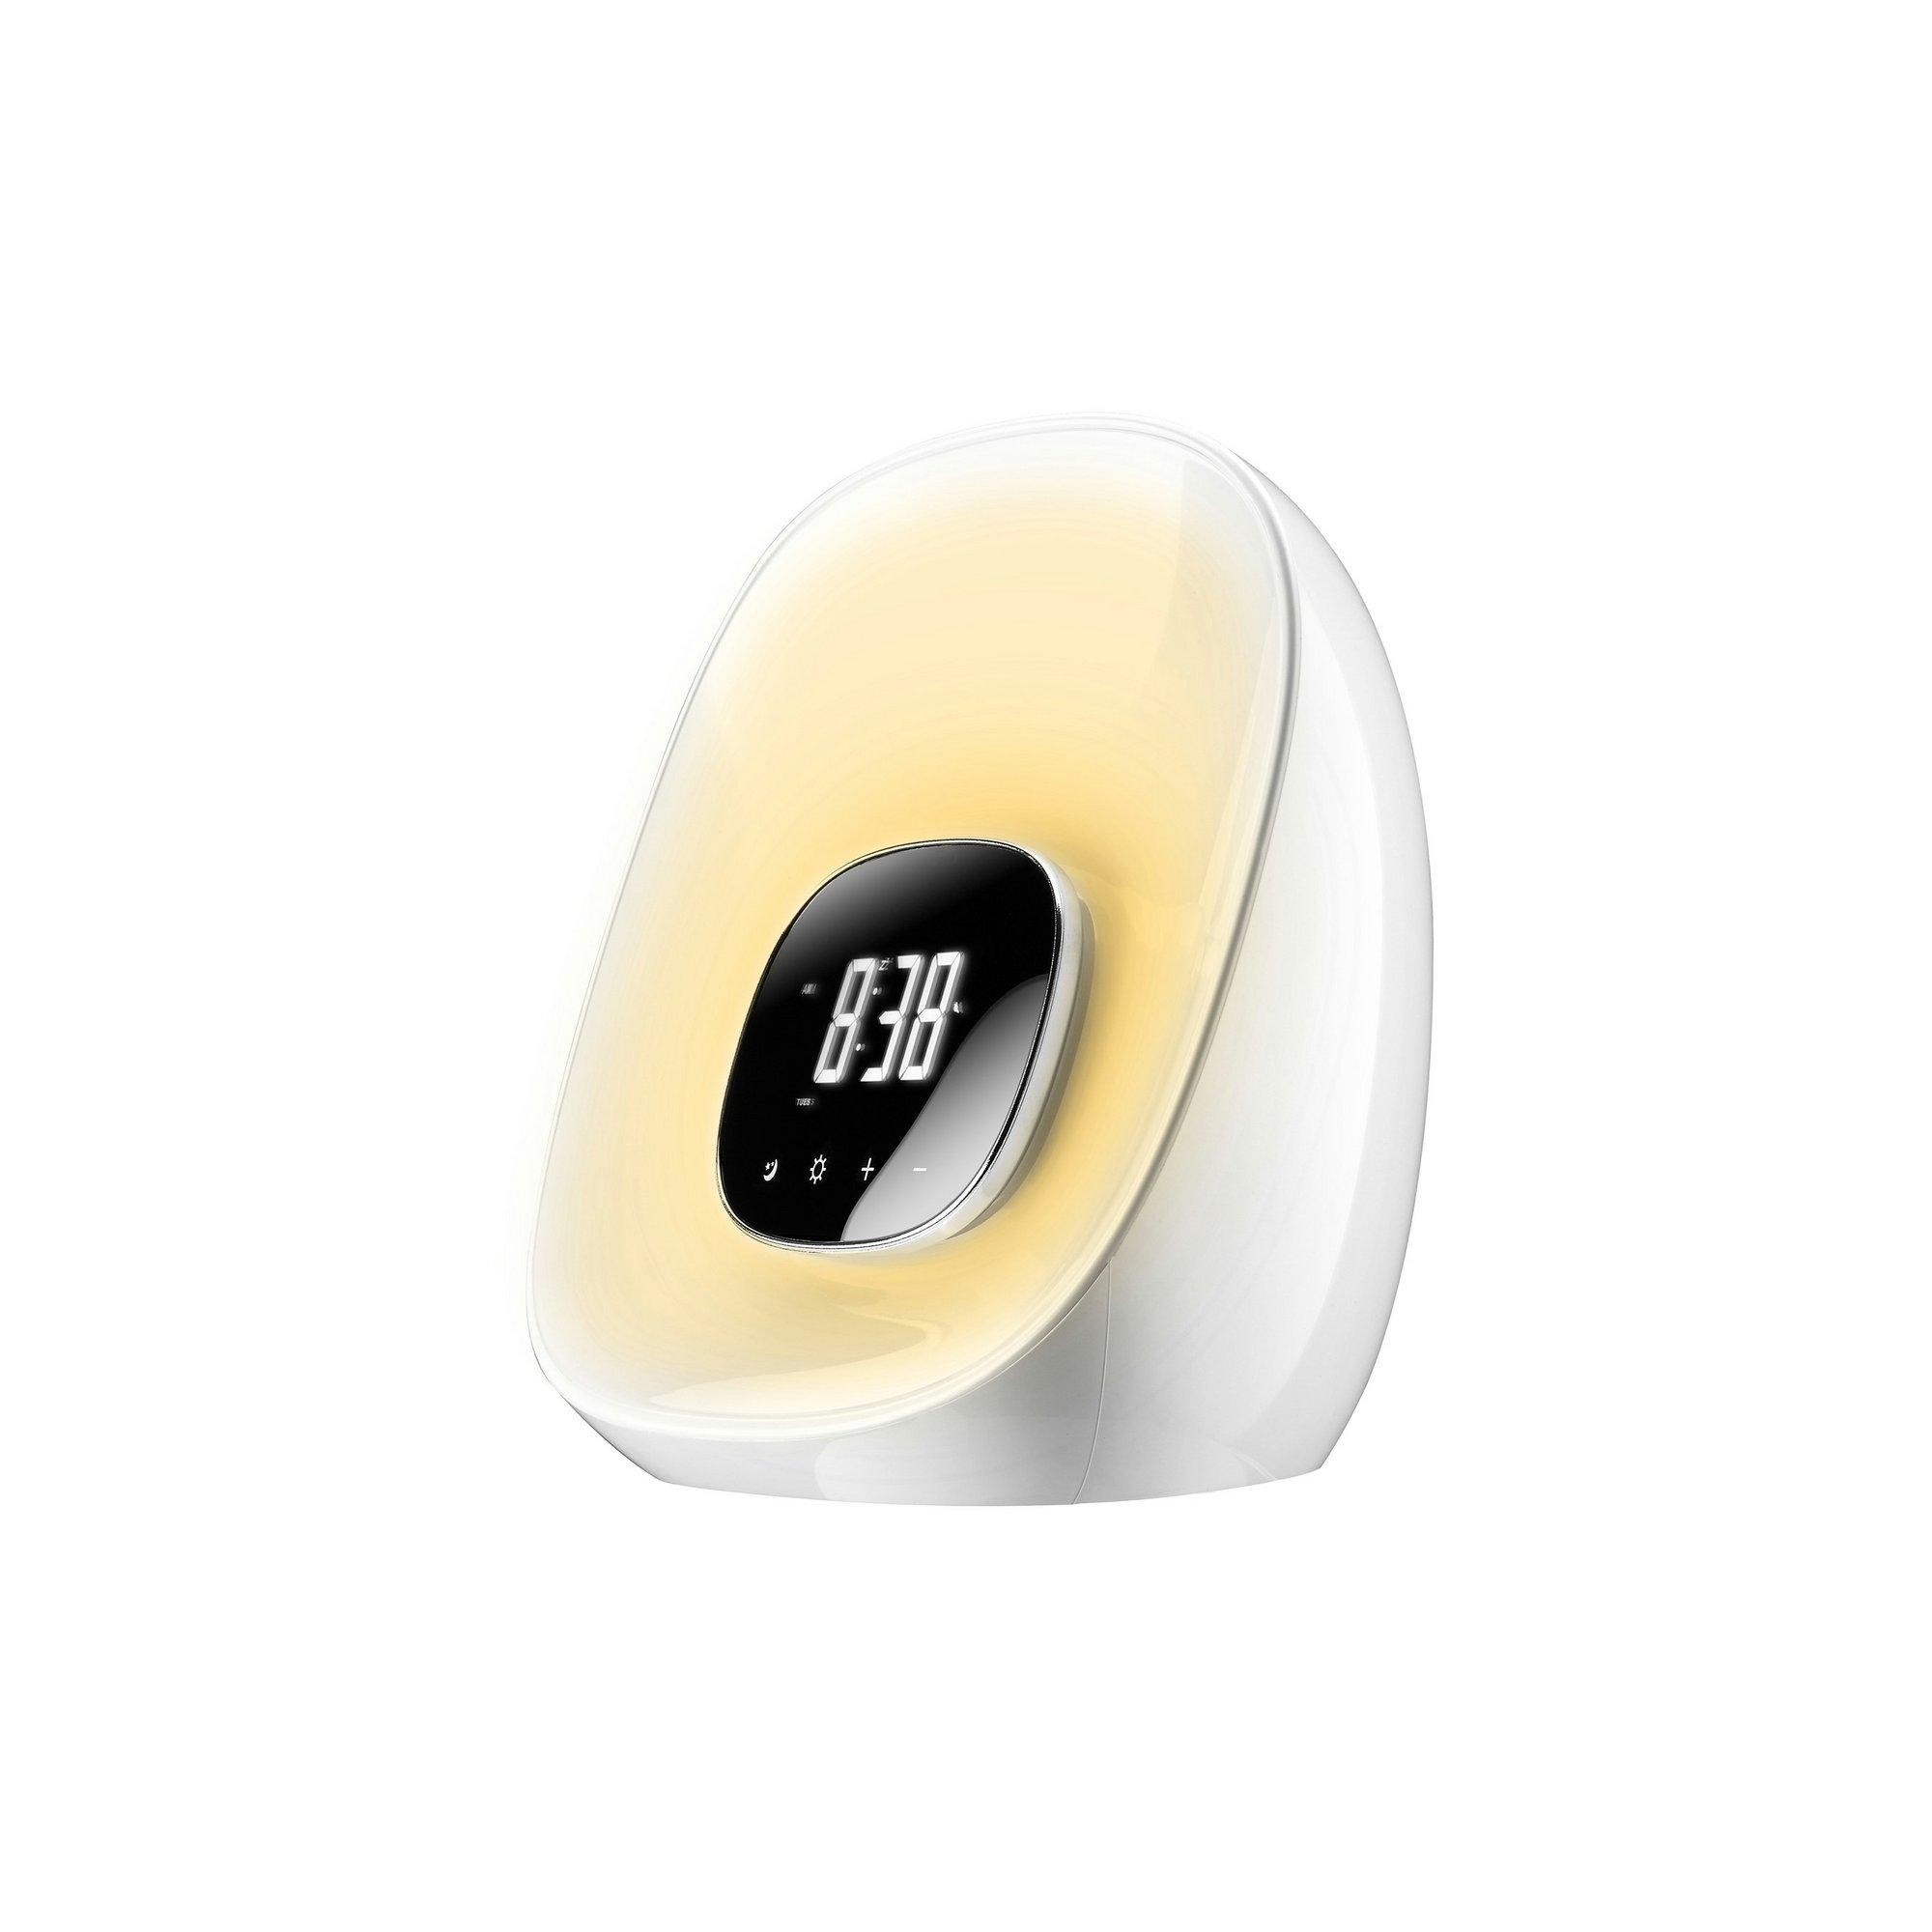 Image of Groov-e GVCR01WE Light Curve Wake Up Alarm Clock Radio